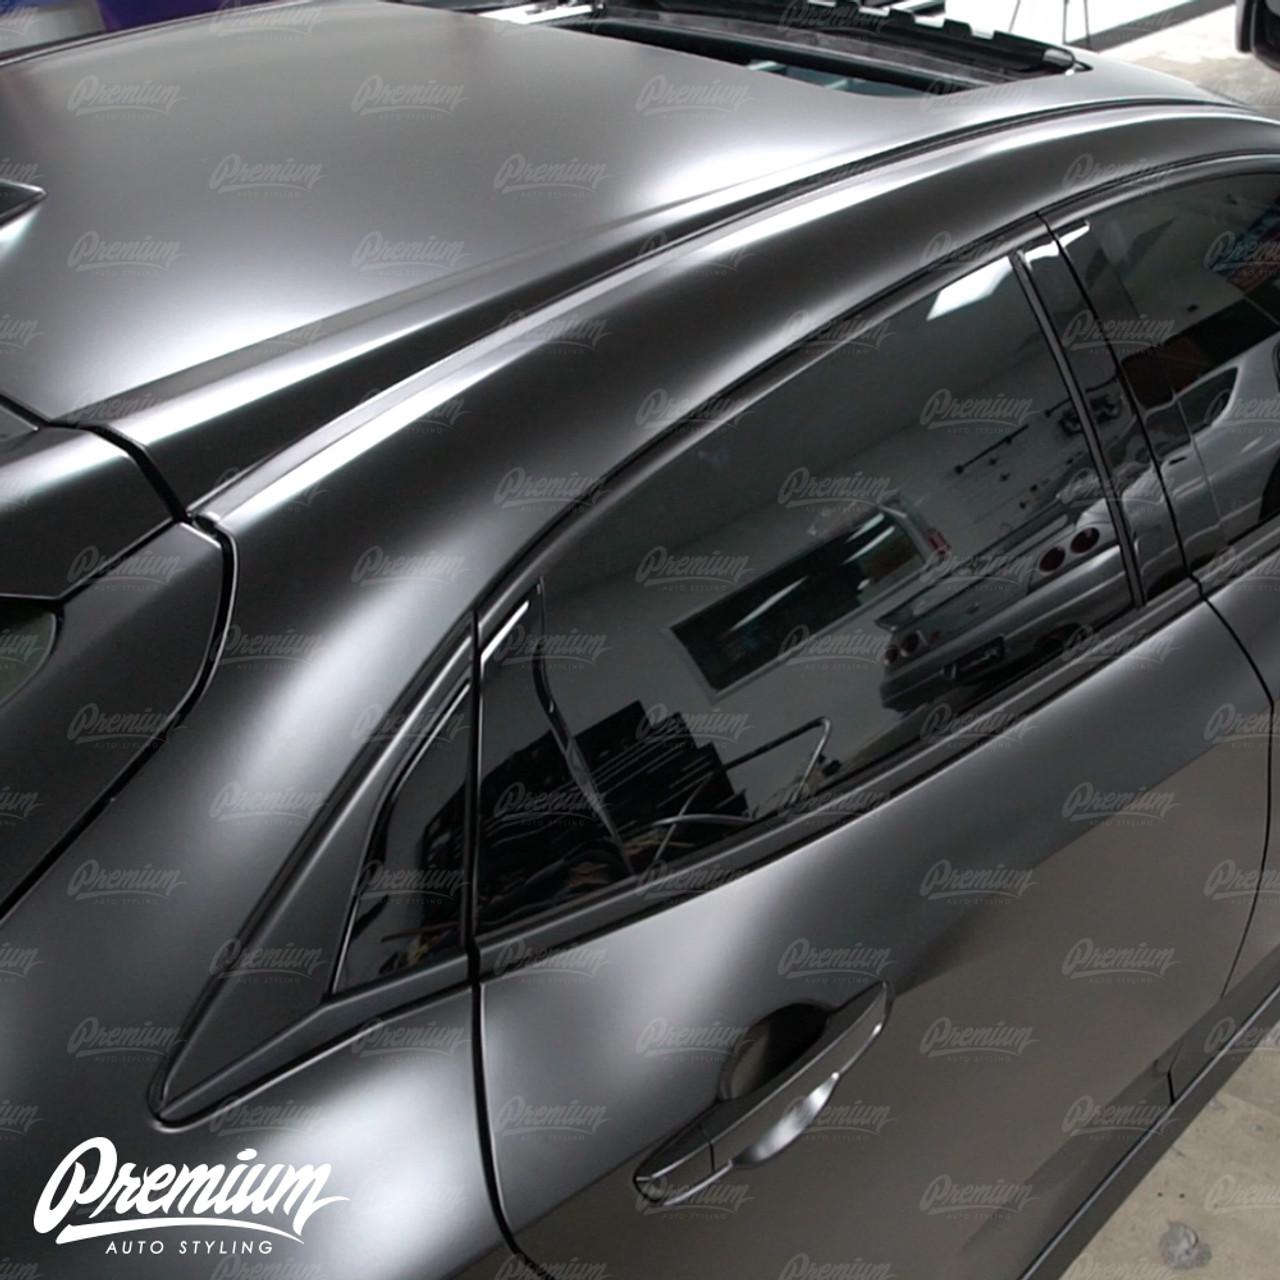 Window Trim Chrome Delete Vinyl Overlay Kit Satin Black 2016 2020 Honda Civic Hatchback Premium Auto Styling